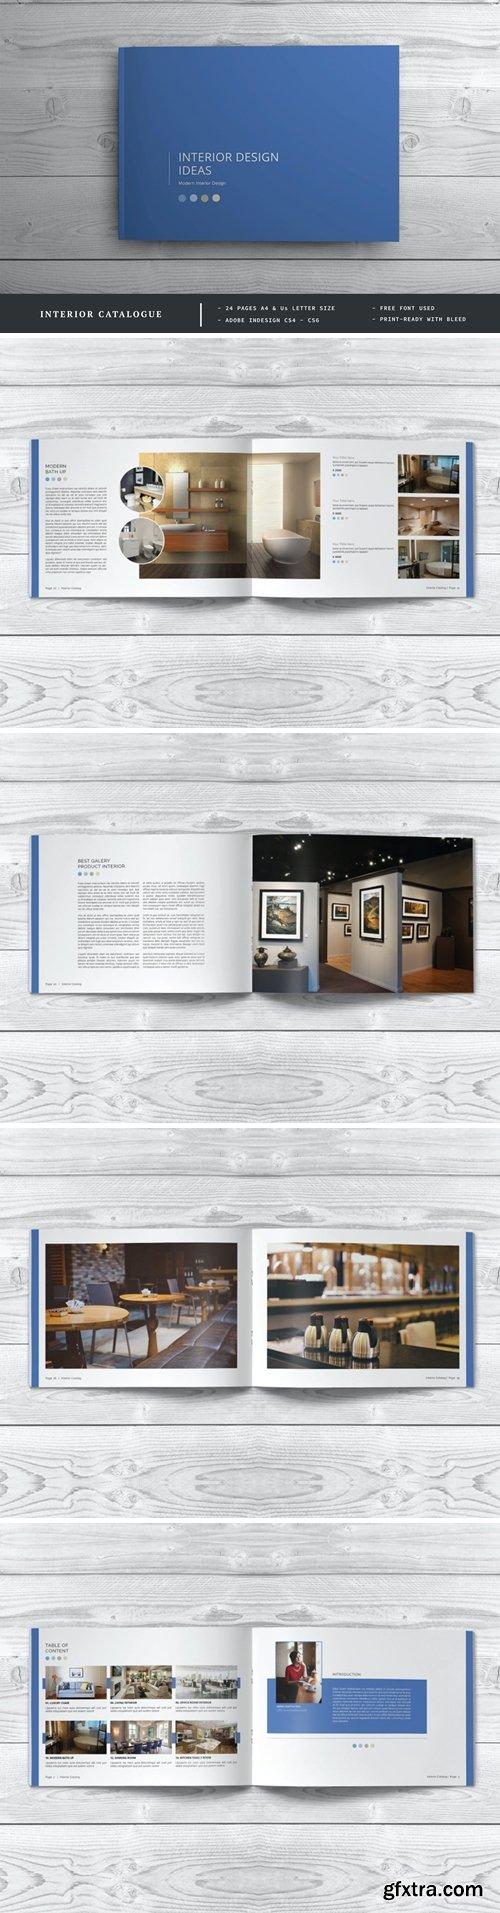 Interior design Brochure / Catalog Template